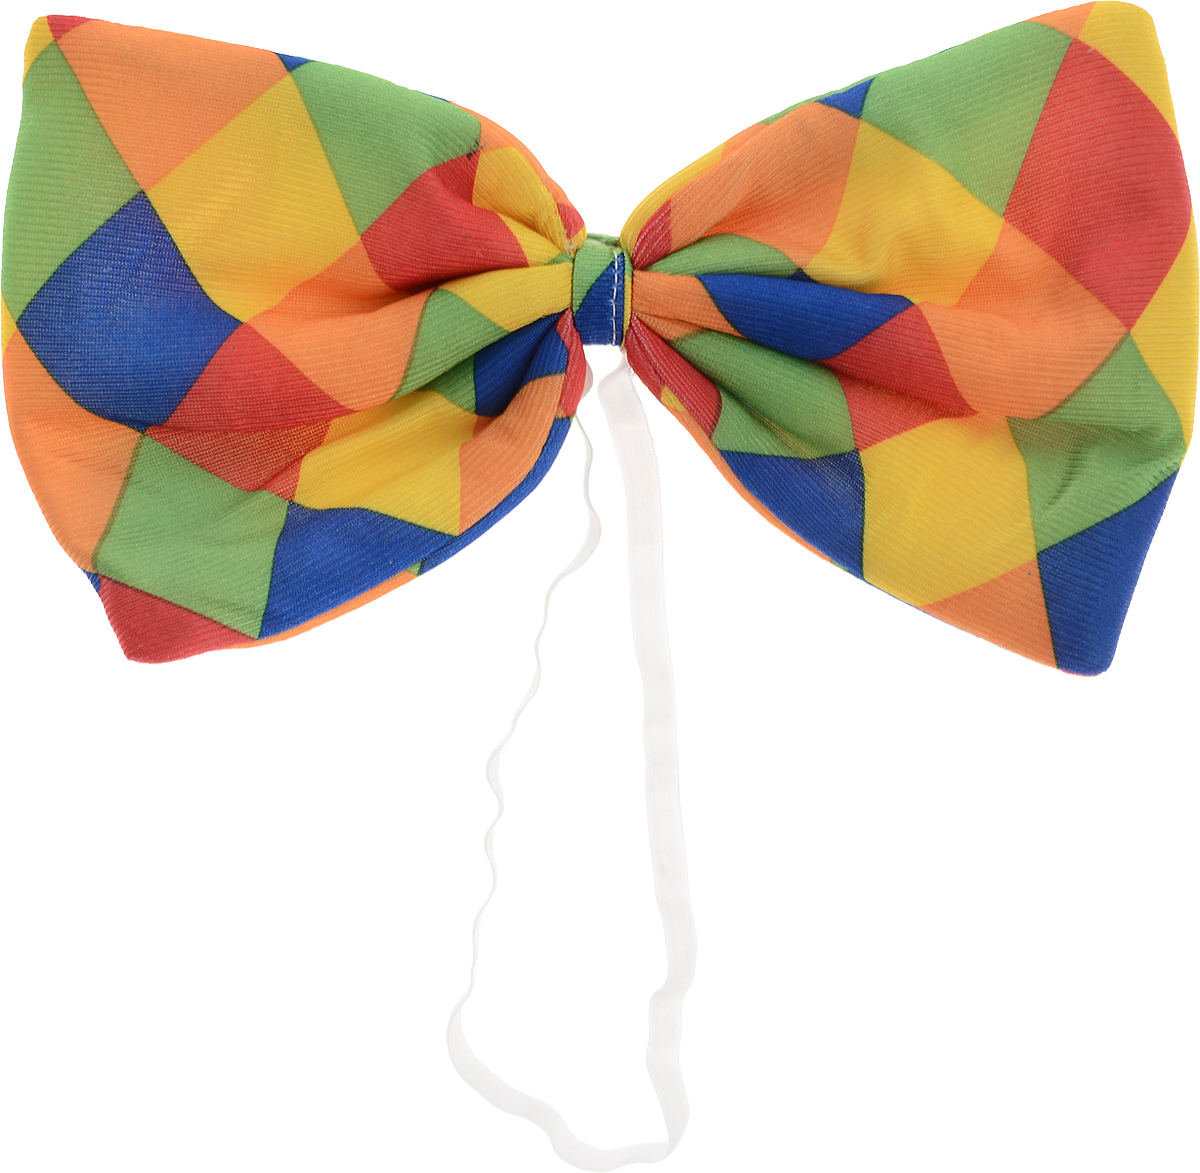 Rio Аксессуар дял карнавального костюма Бабочка клоуна -  Аксессуры для карнавальных костюмов